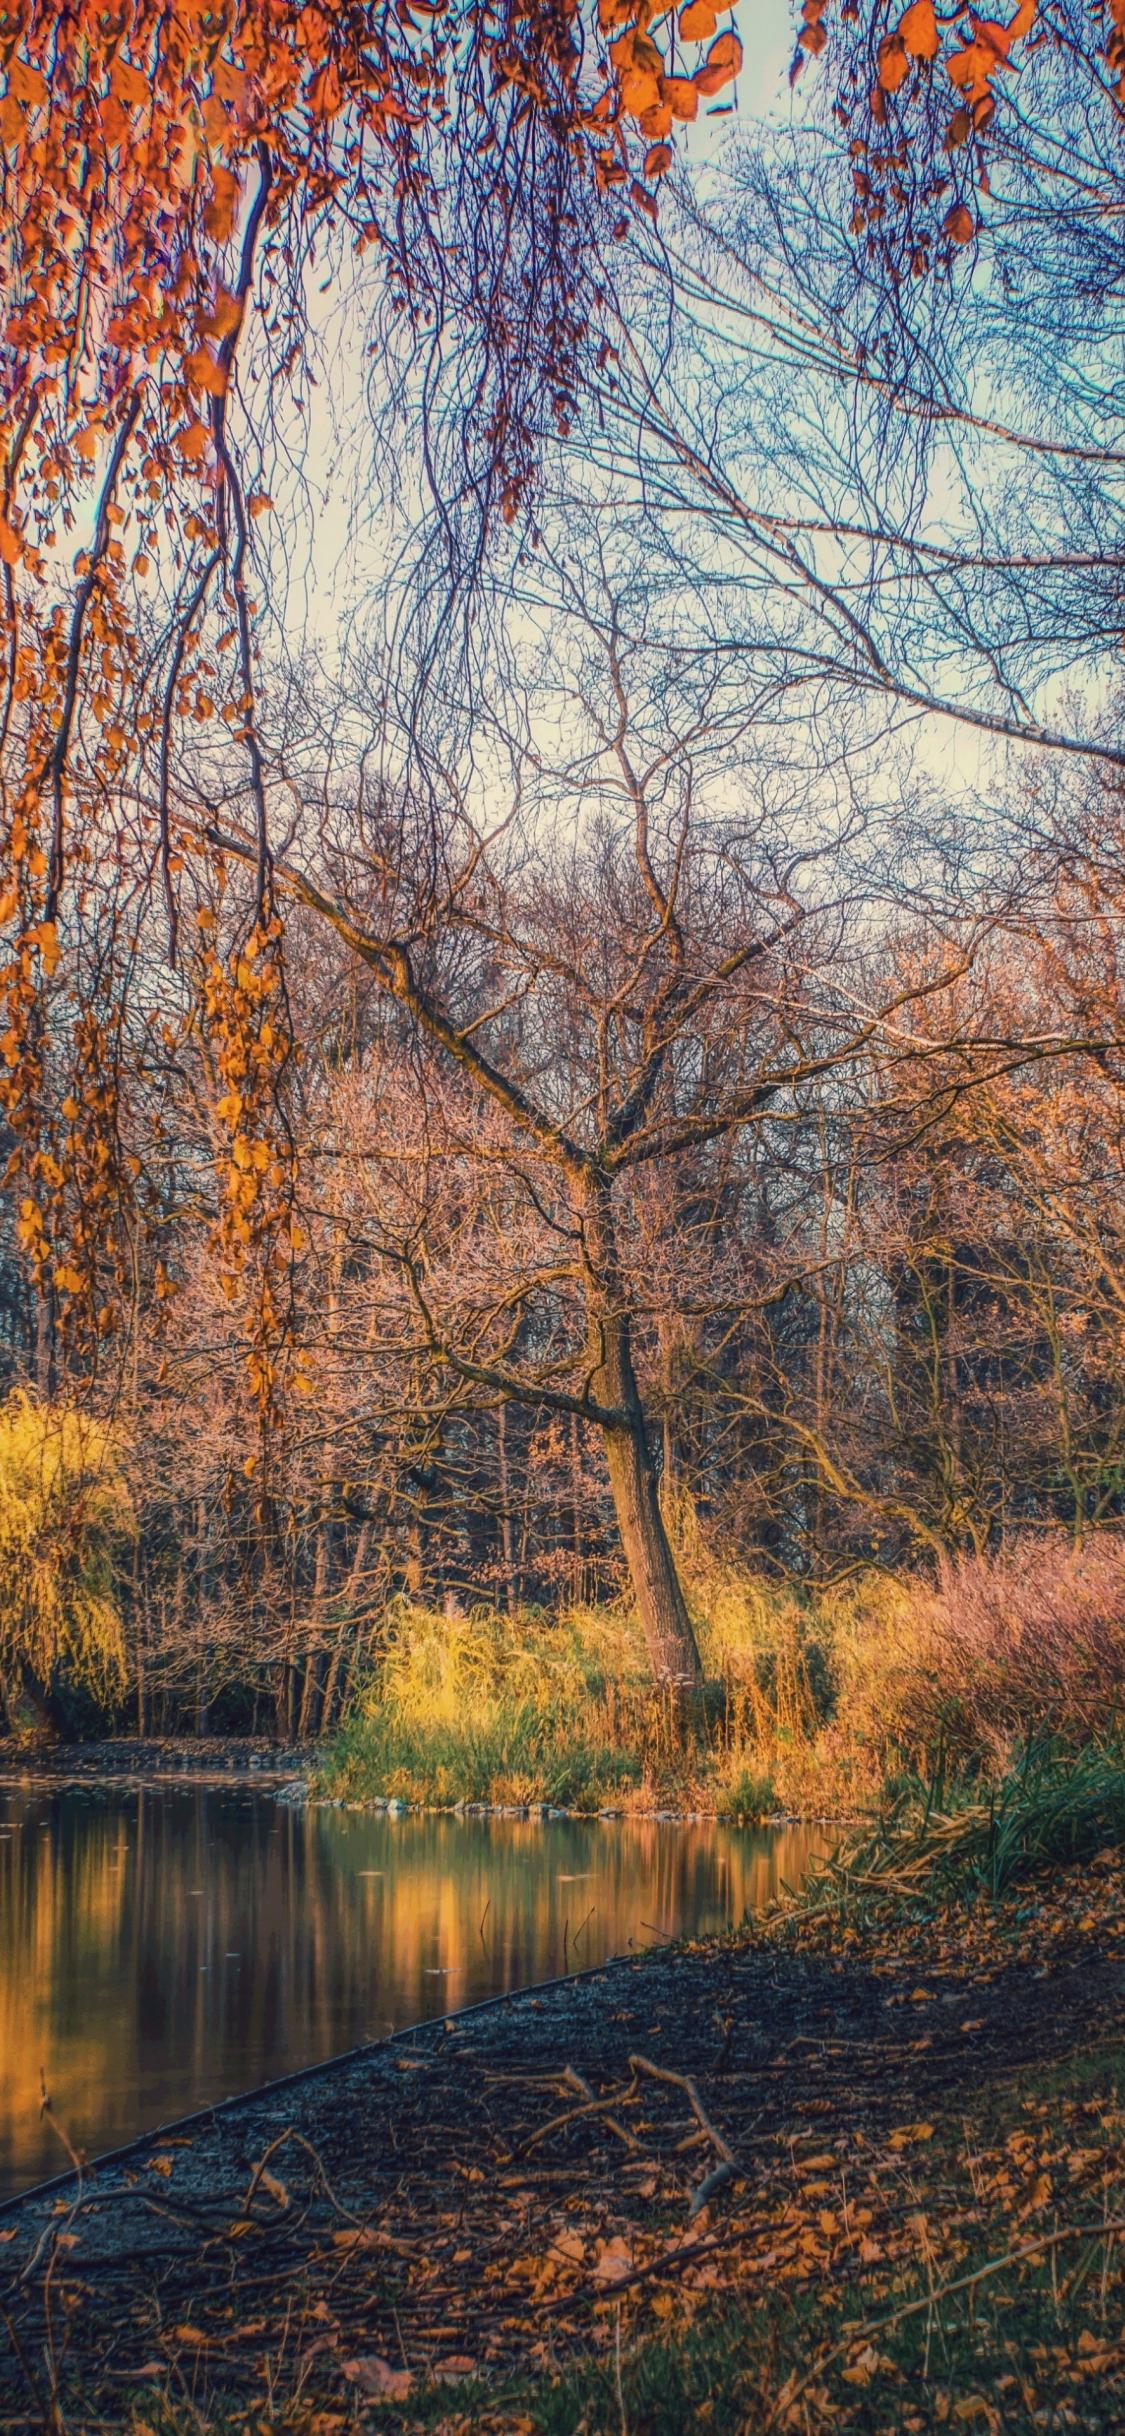 Download 1125x2436 Wallpaper Lake Nature Tree Autumn